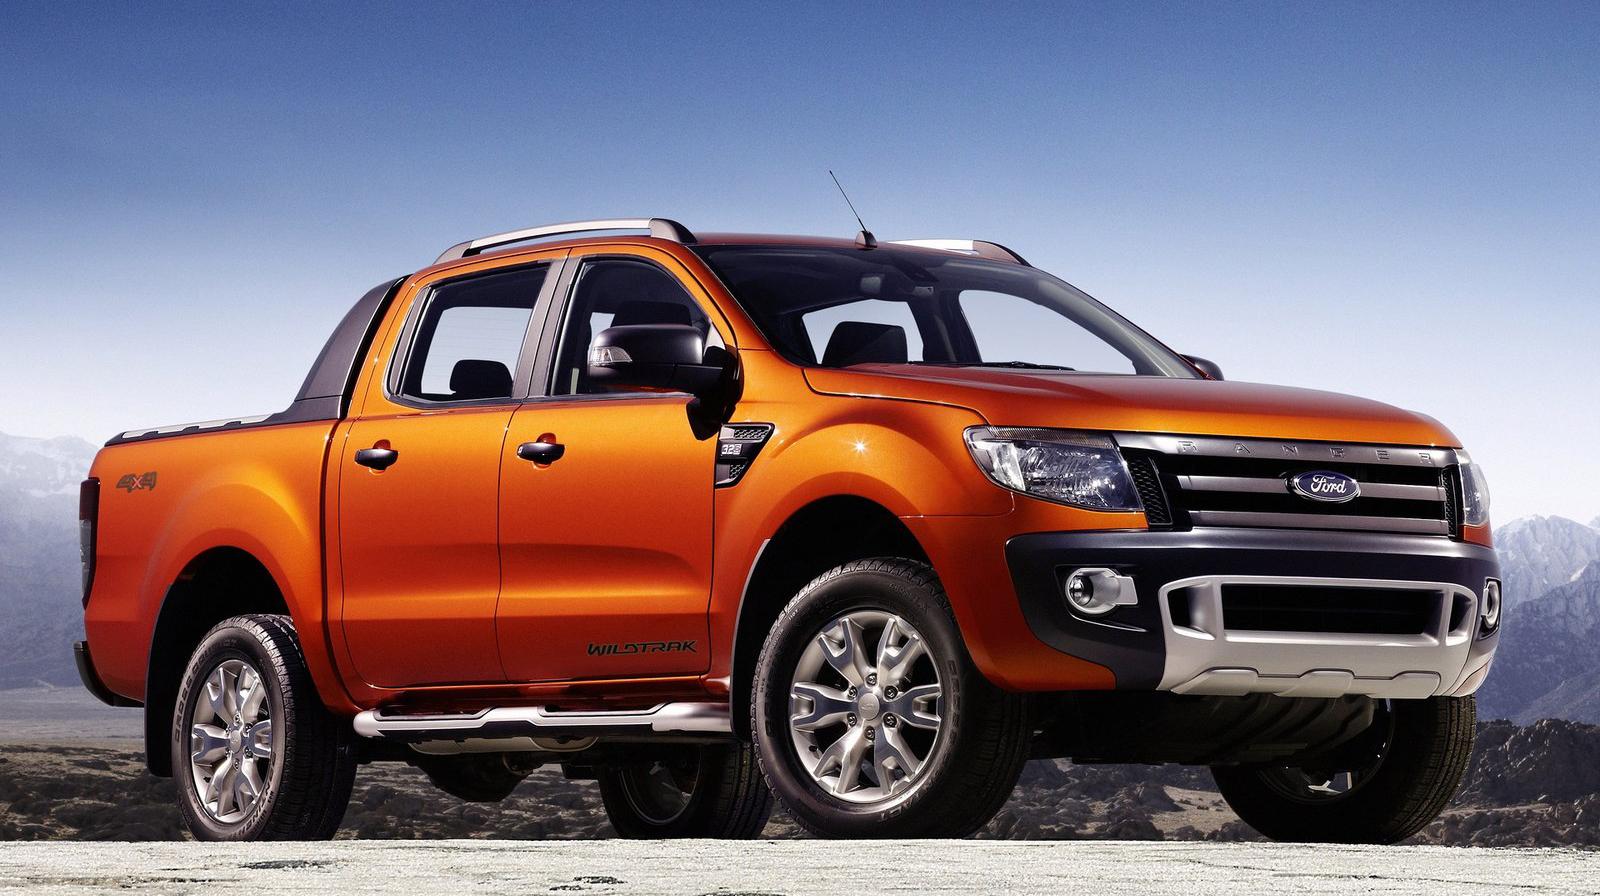 Ford_Ranger_Wildtrak_3.2L_AT_4x4